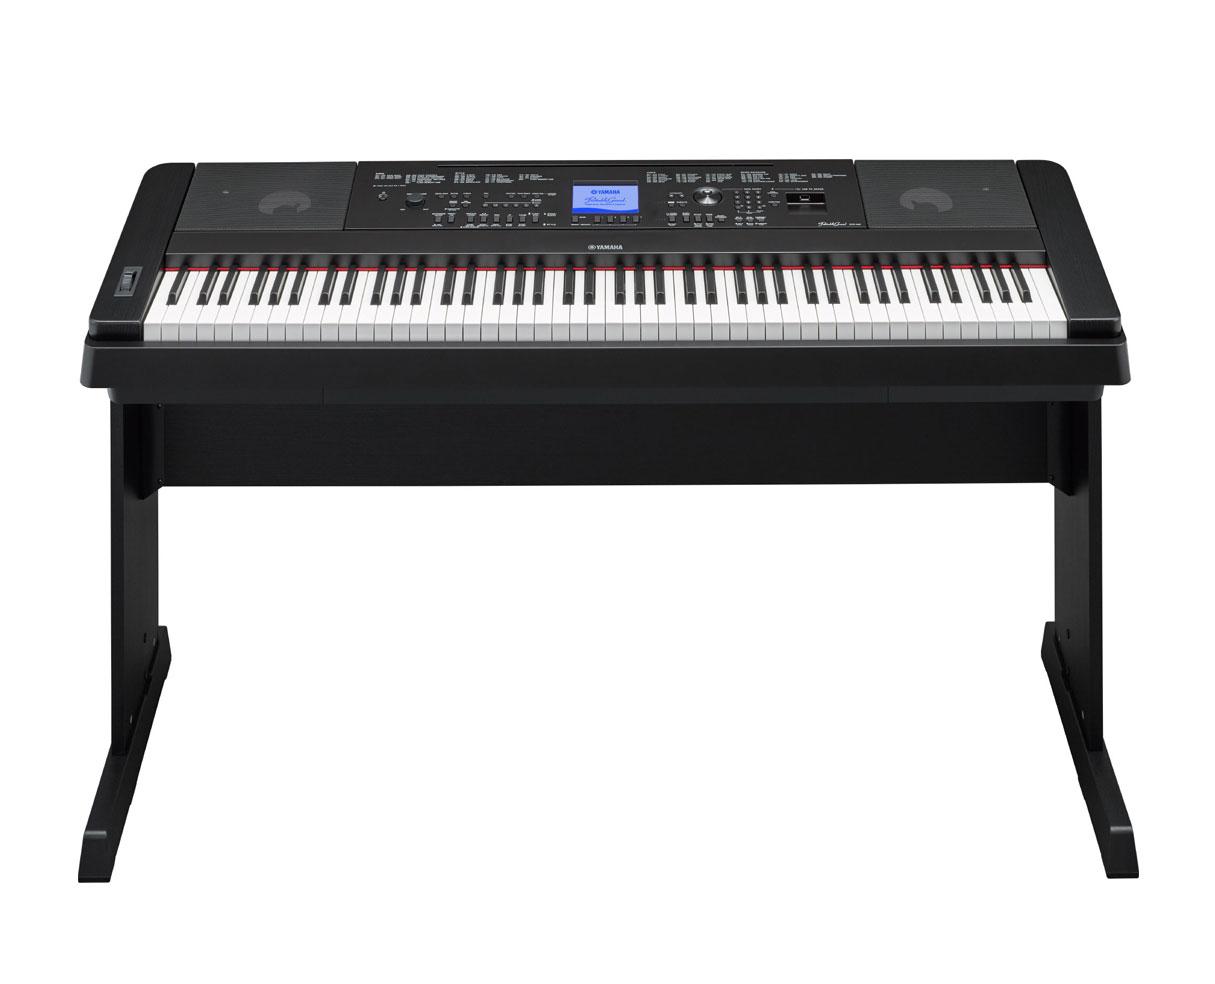 yamaha dgx660b dgx 660 88 key ensemble digital piano w. Black Bedroom Furniture Sets. Home Design Ideas